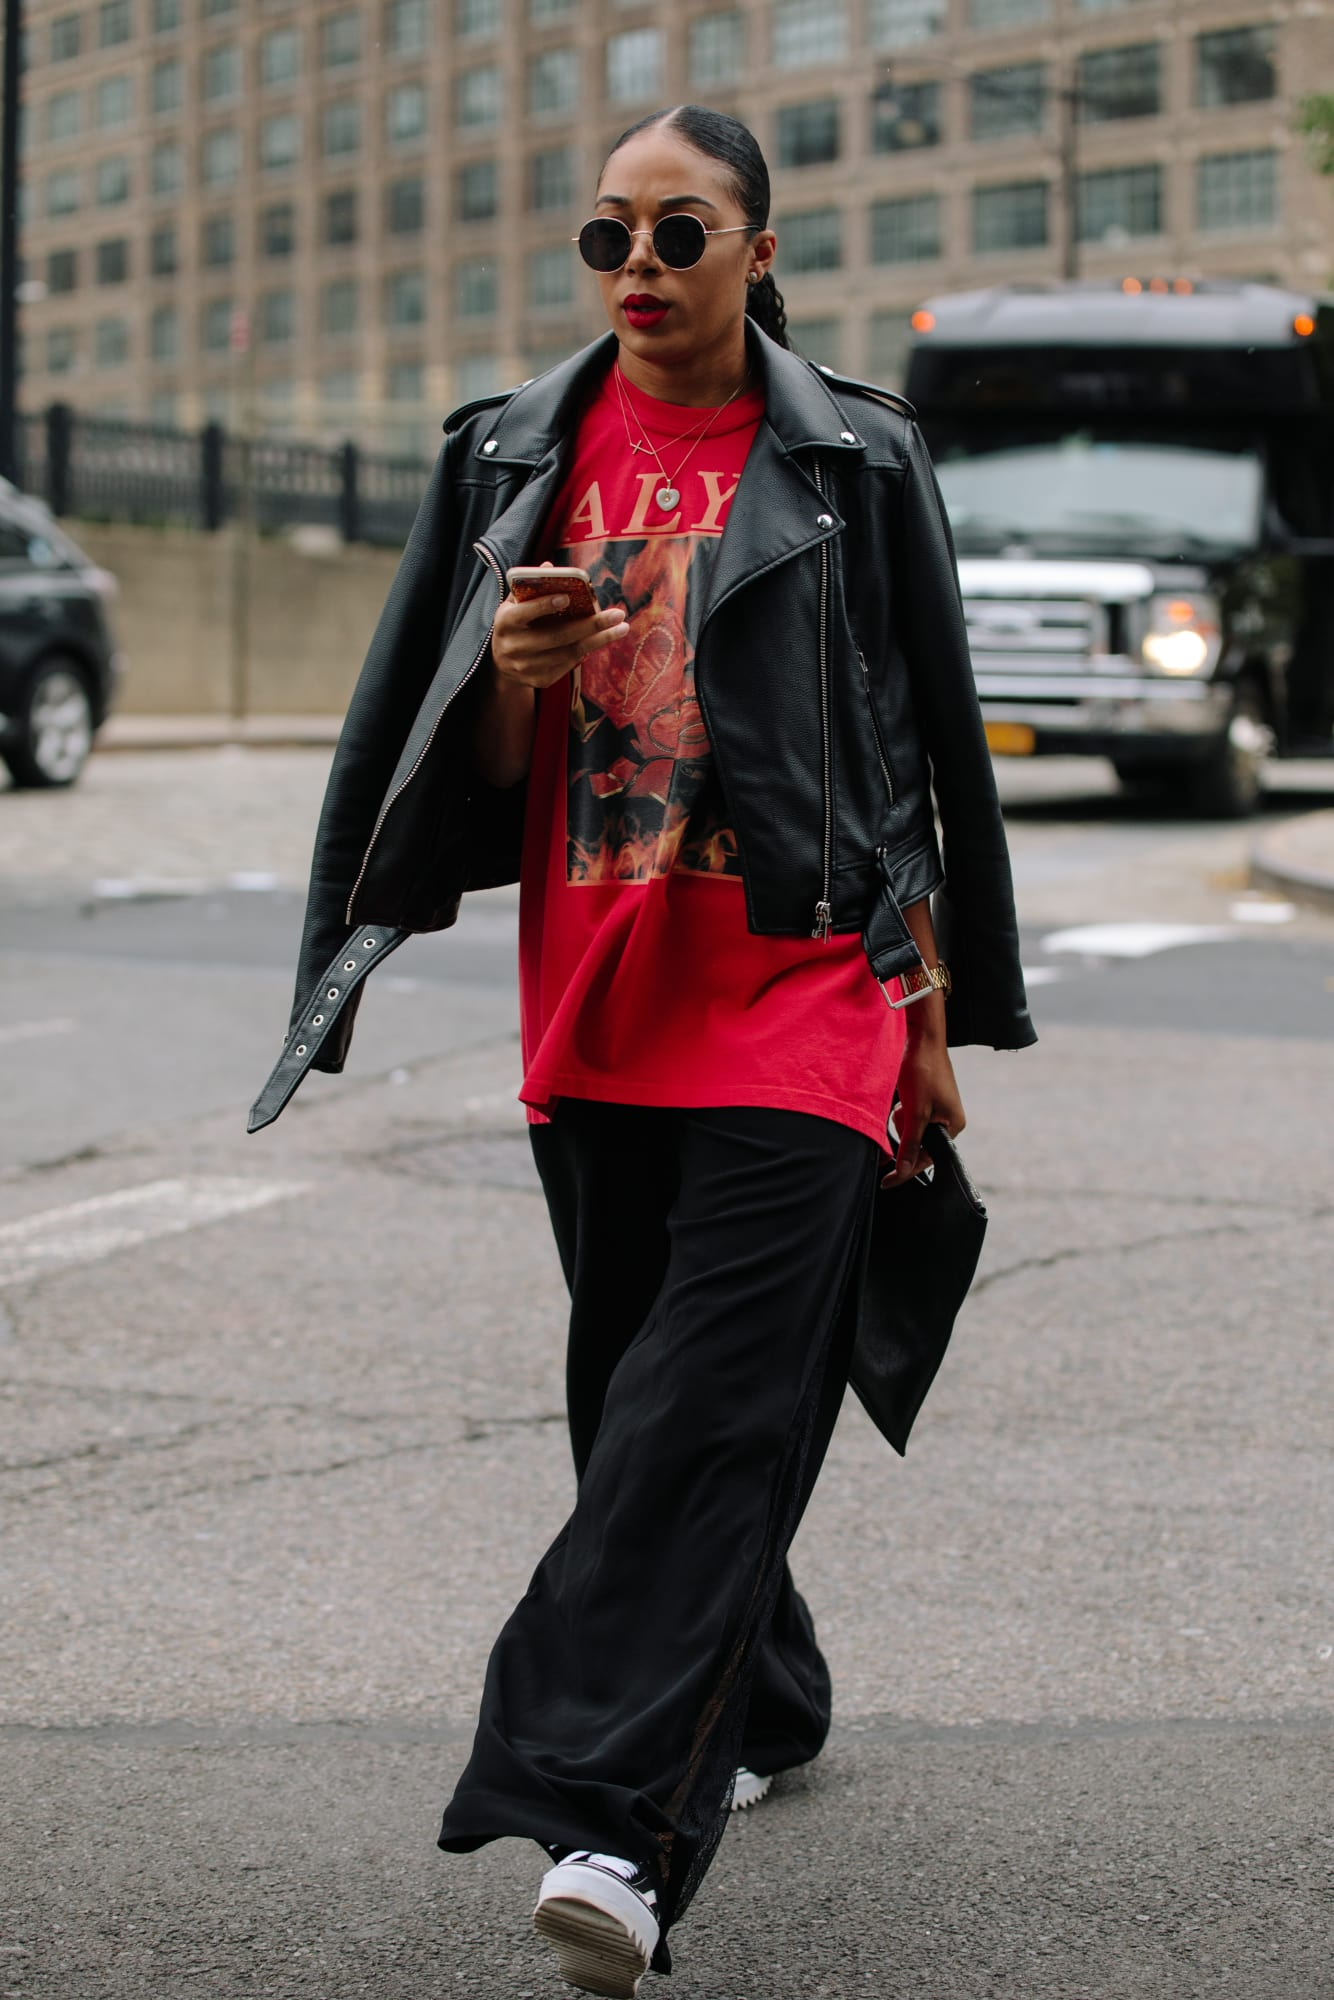 new-york-fashion-week-street-style-spring-2019-day-3-3.jpg